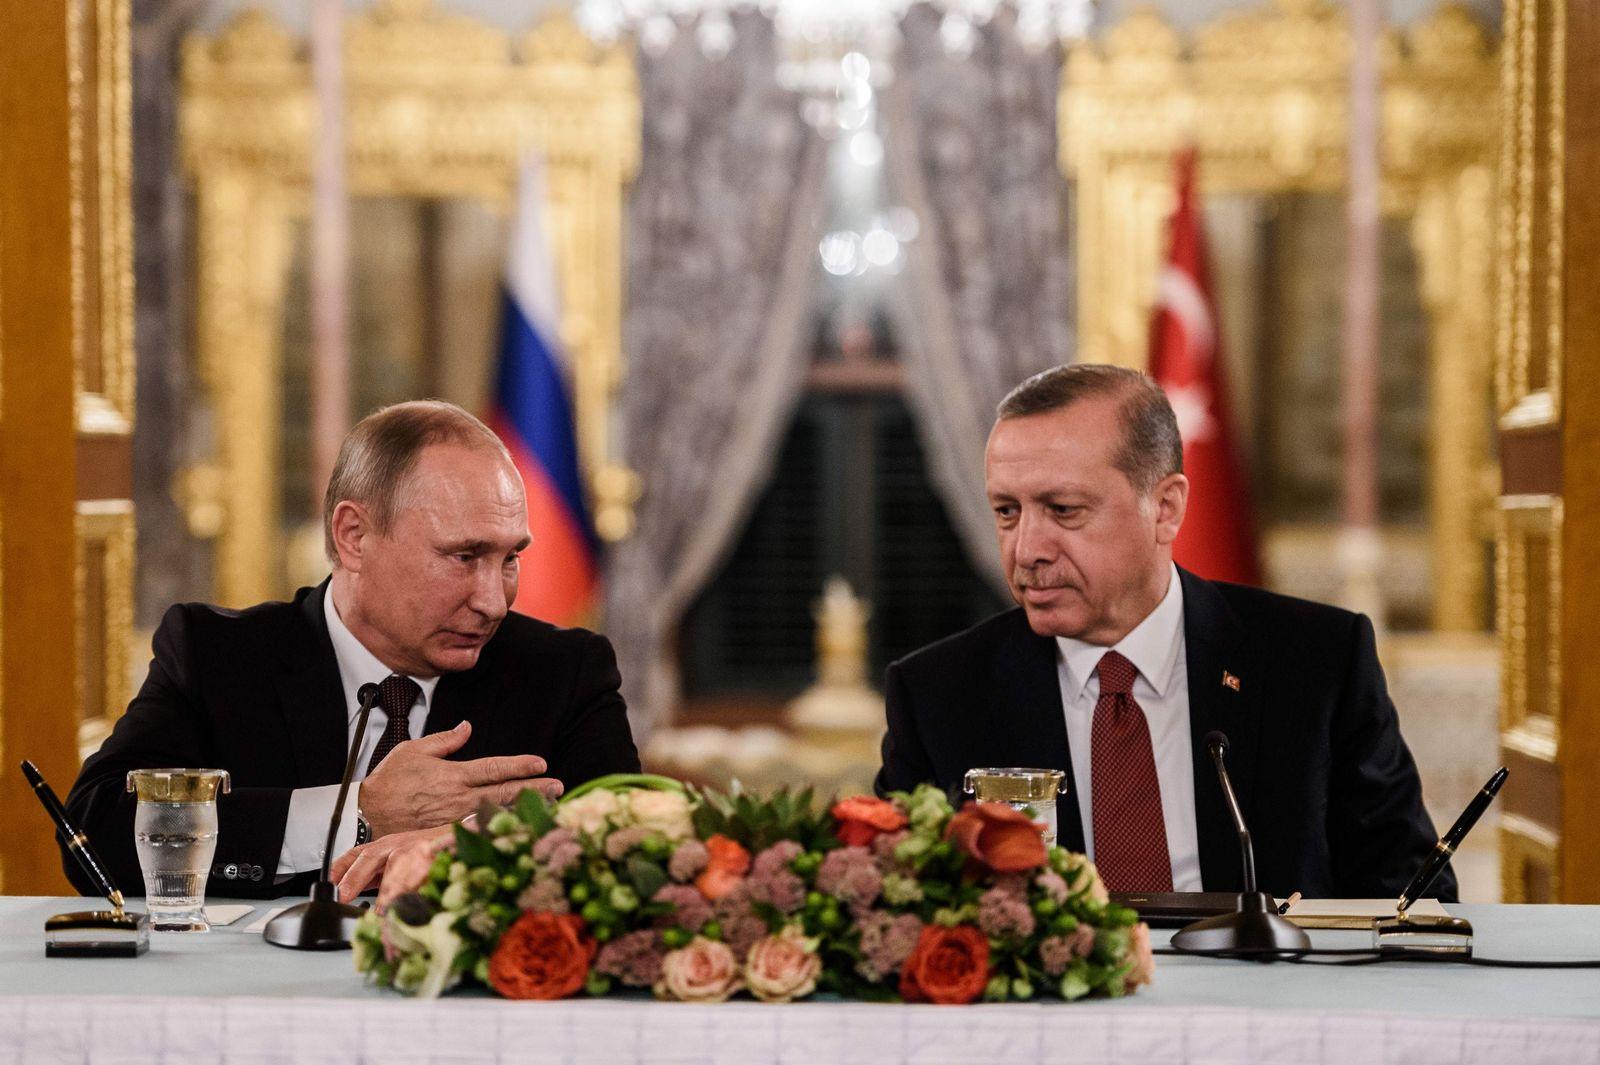 Putin / Erdogan